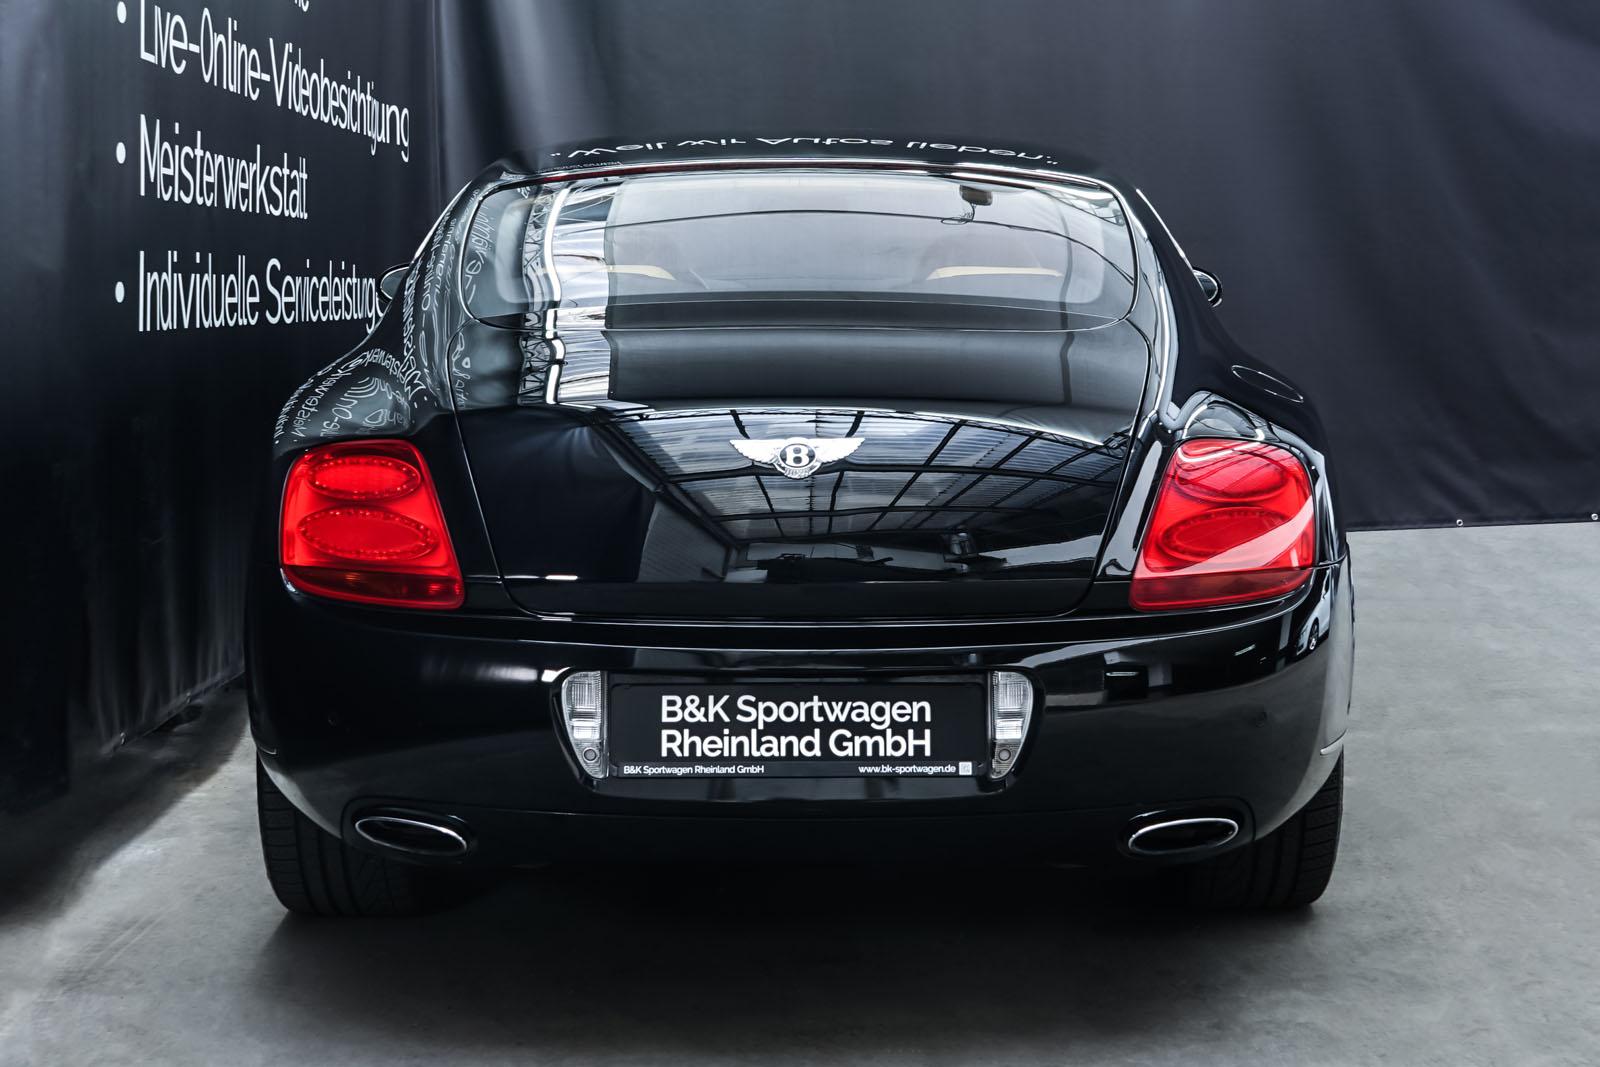 Bentley_Continental_GT_Schwarz_Beige_BEN-1159_12_w